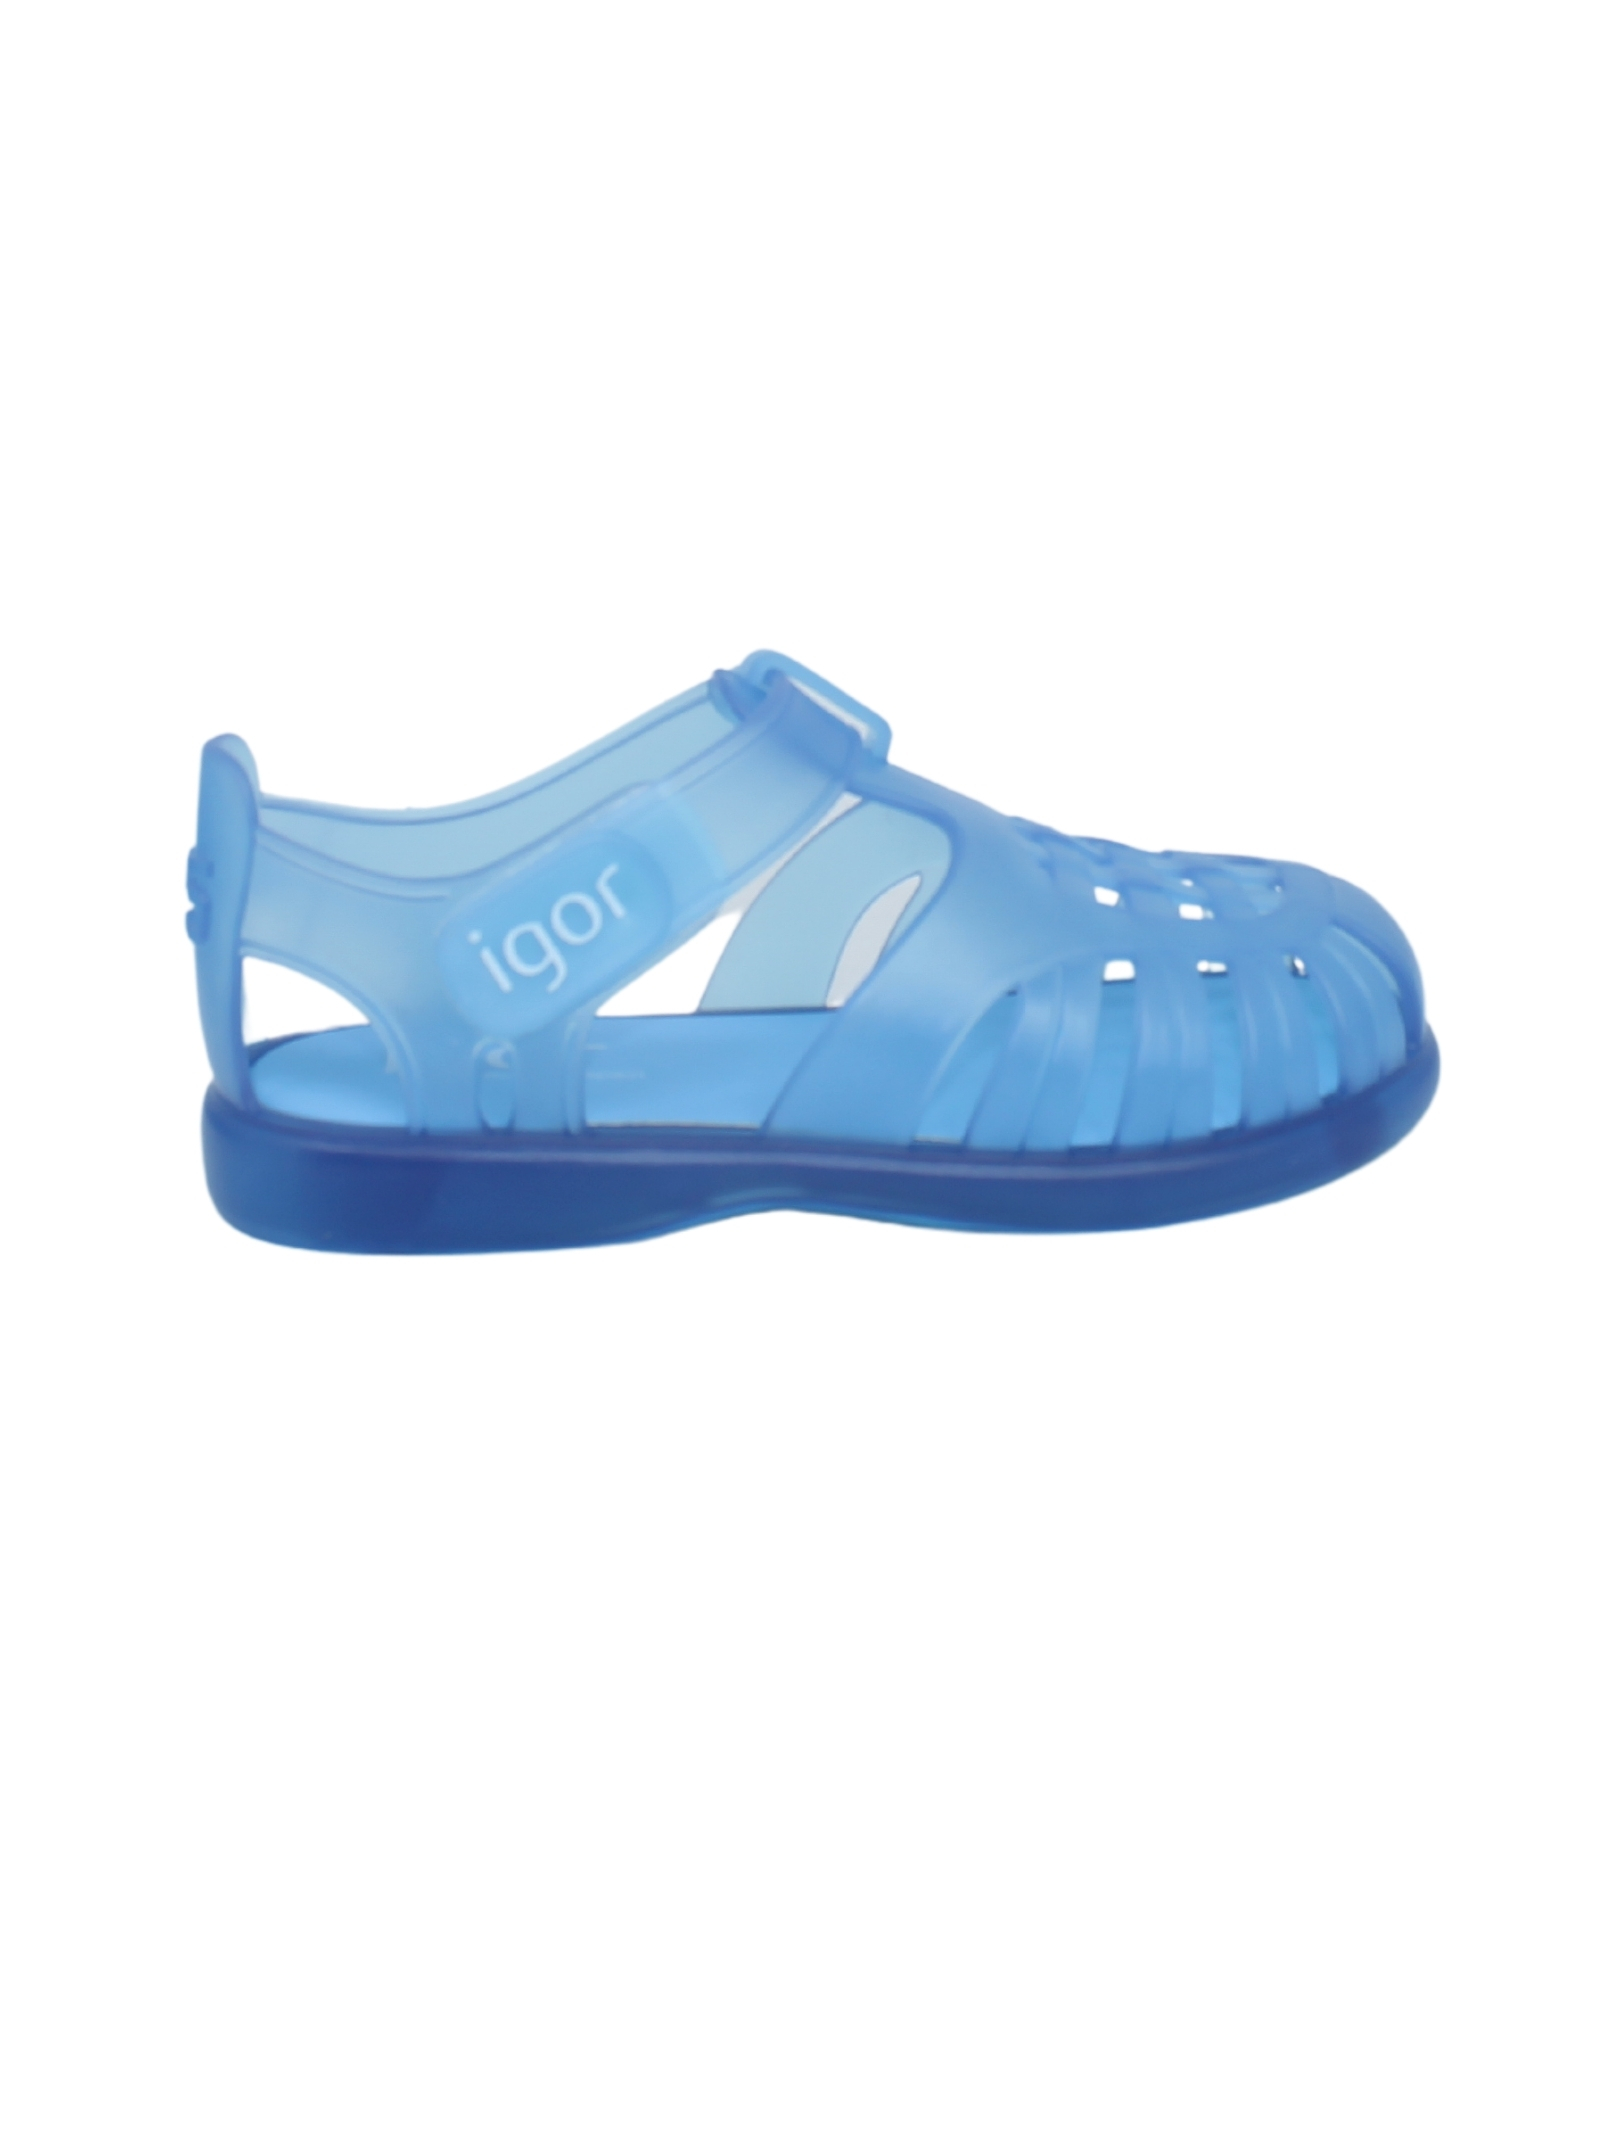 IGOR KIDS | Flip Flop | S10233F032